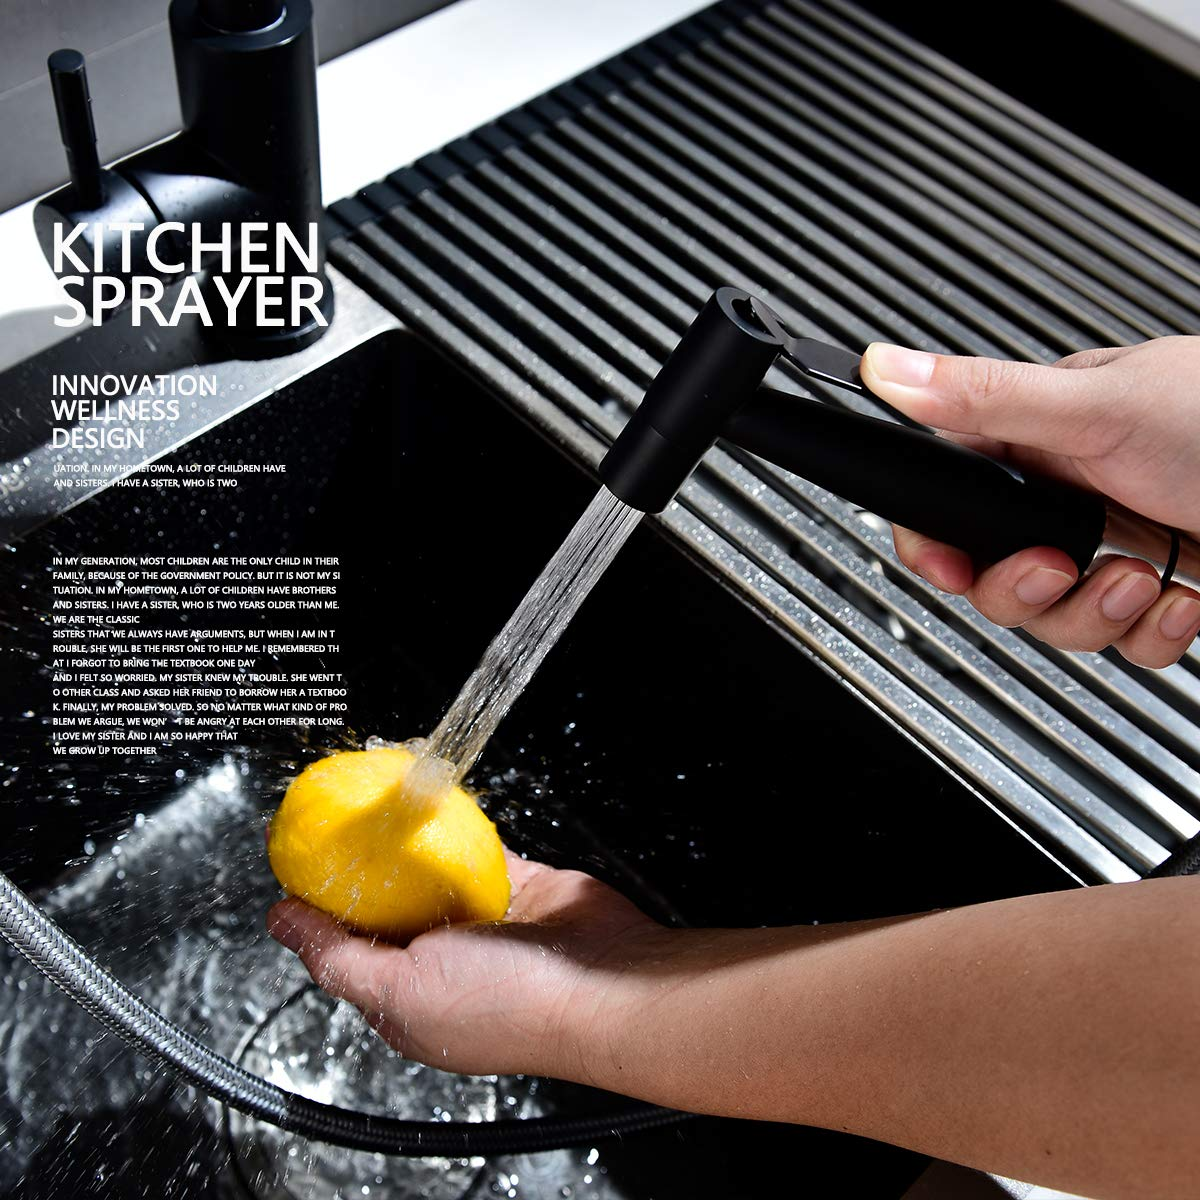 WS030F CIENCIA Grifo Fregadero Acero Inoxidable Grifo Cocina Extraible Ducha de Lavabo 360/° Giratorio Grifo de Cocina Extraible para Fregadero